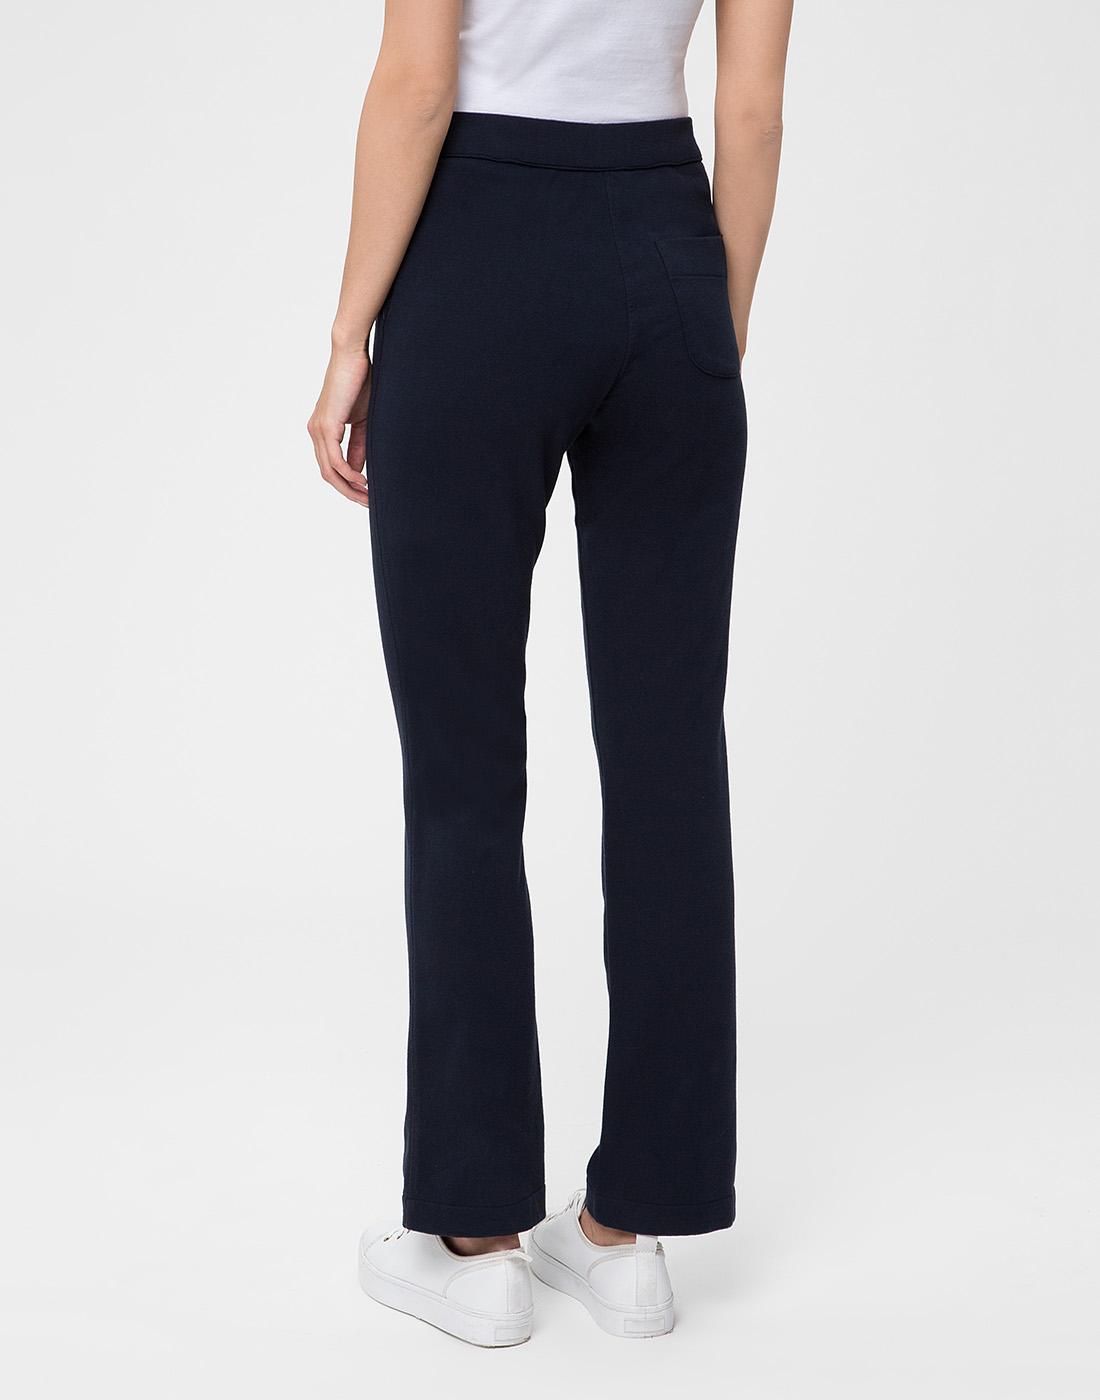 Женские темно-синие спортивные брюки Capobianco S5W715.FZ00.-4